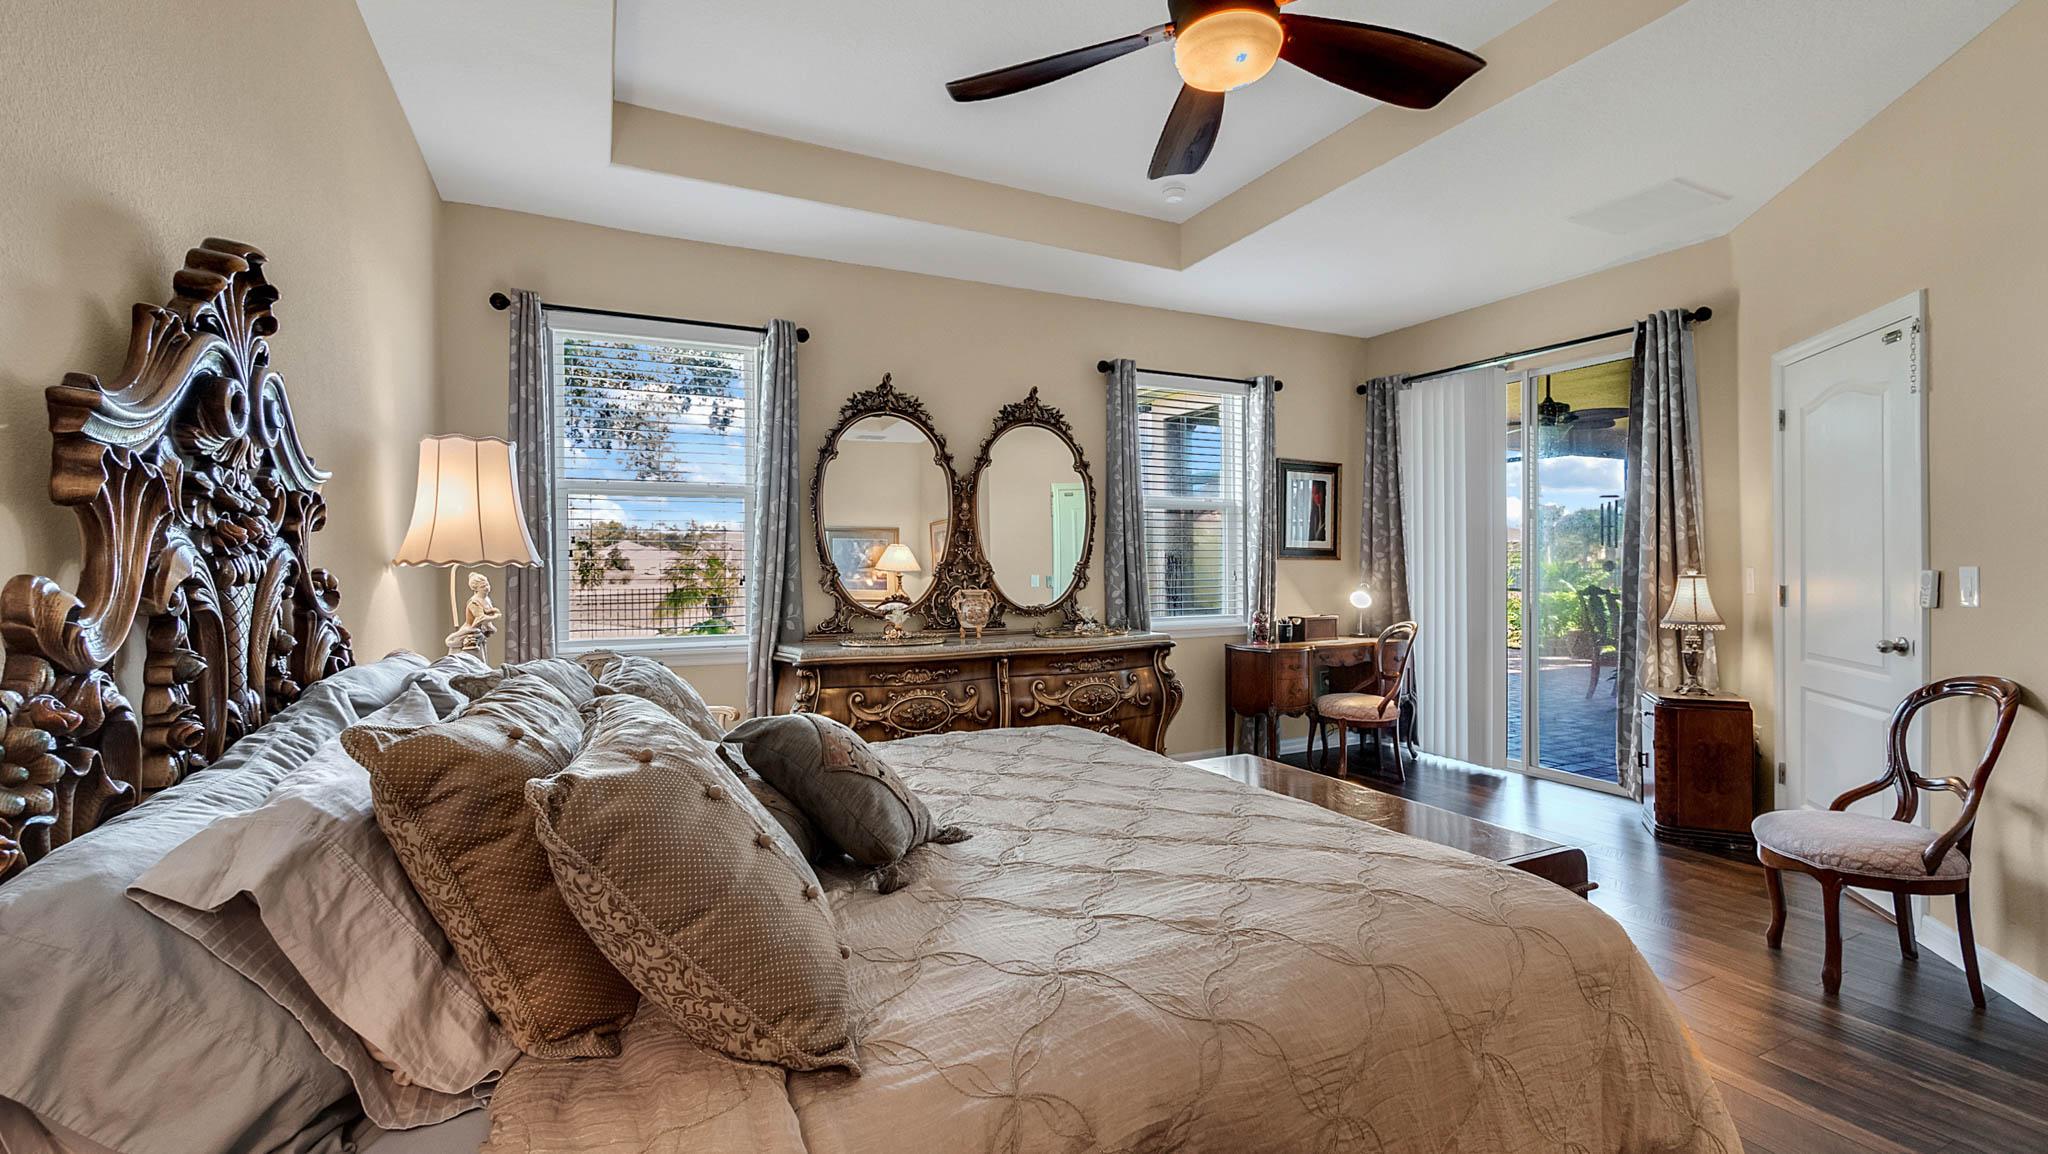 105-W-Cherry-Pl--DeLand--FL-32724----12---Master-Bedroom.jpg